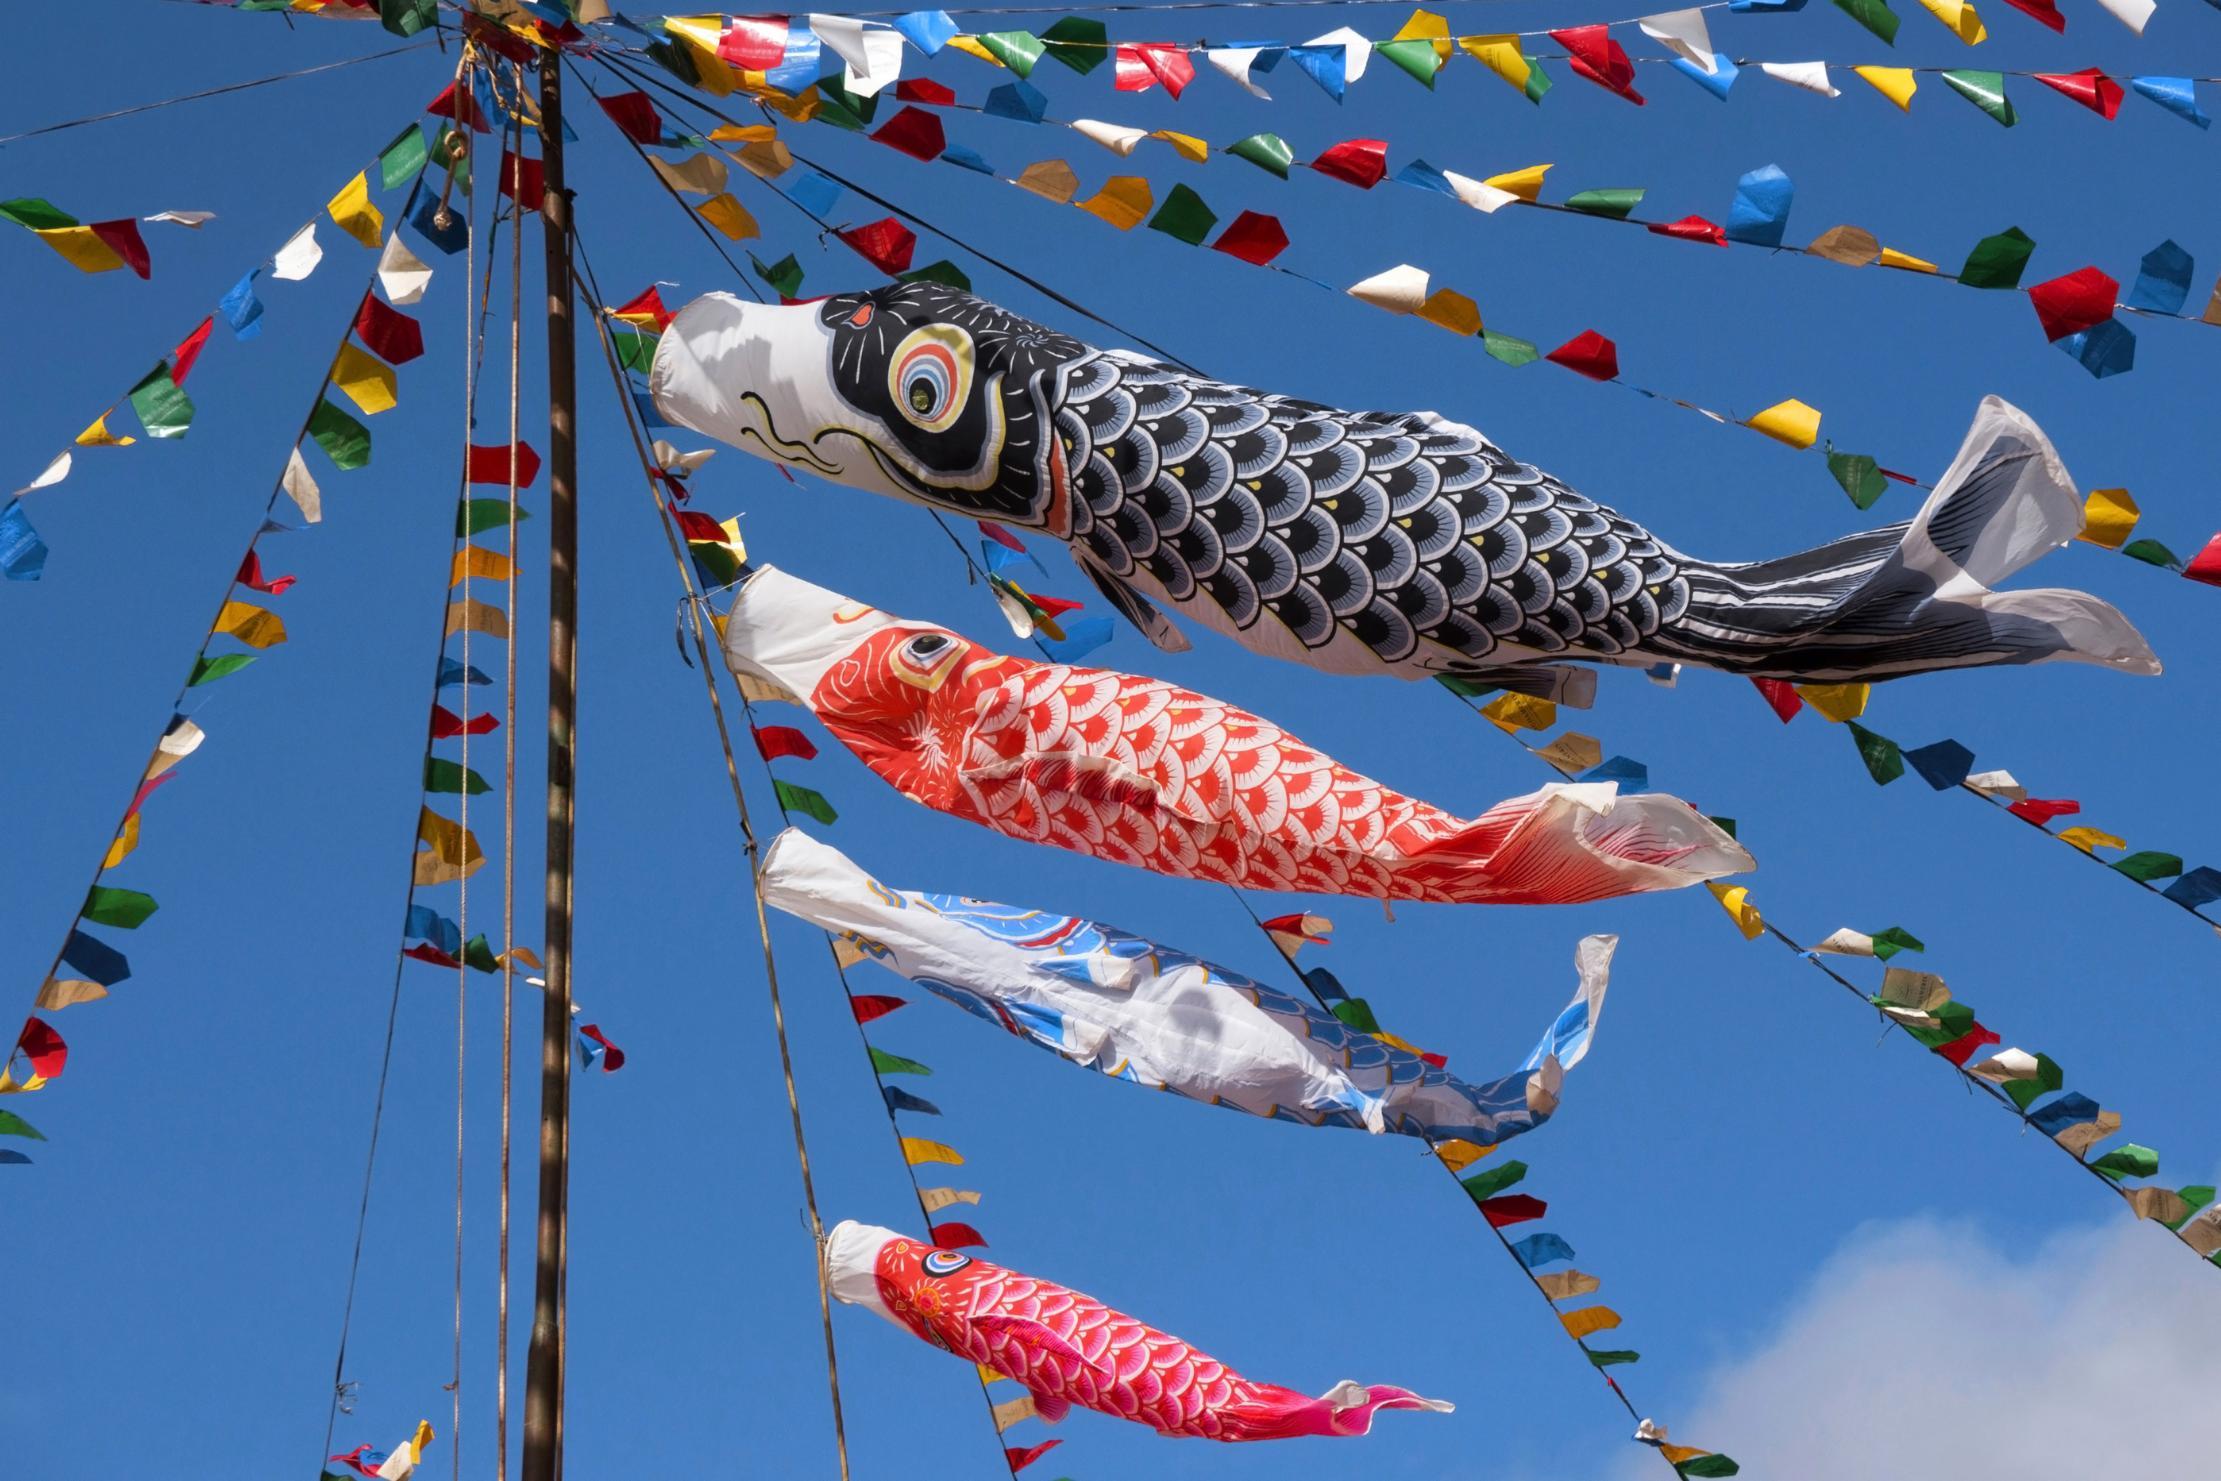 Fabriquer un Koinobori : une tradition japonaise